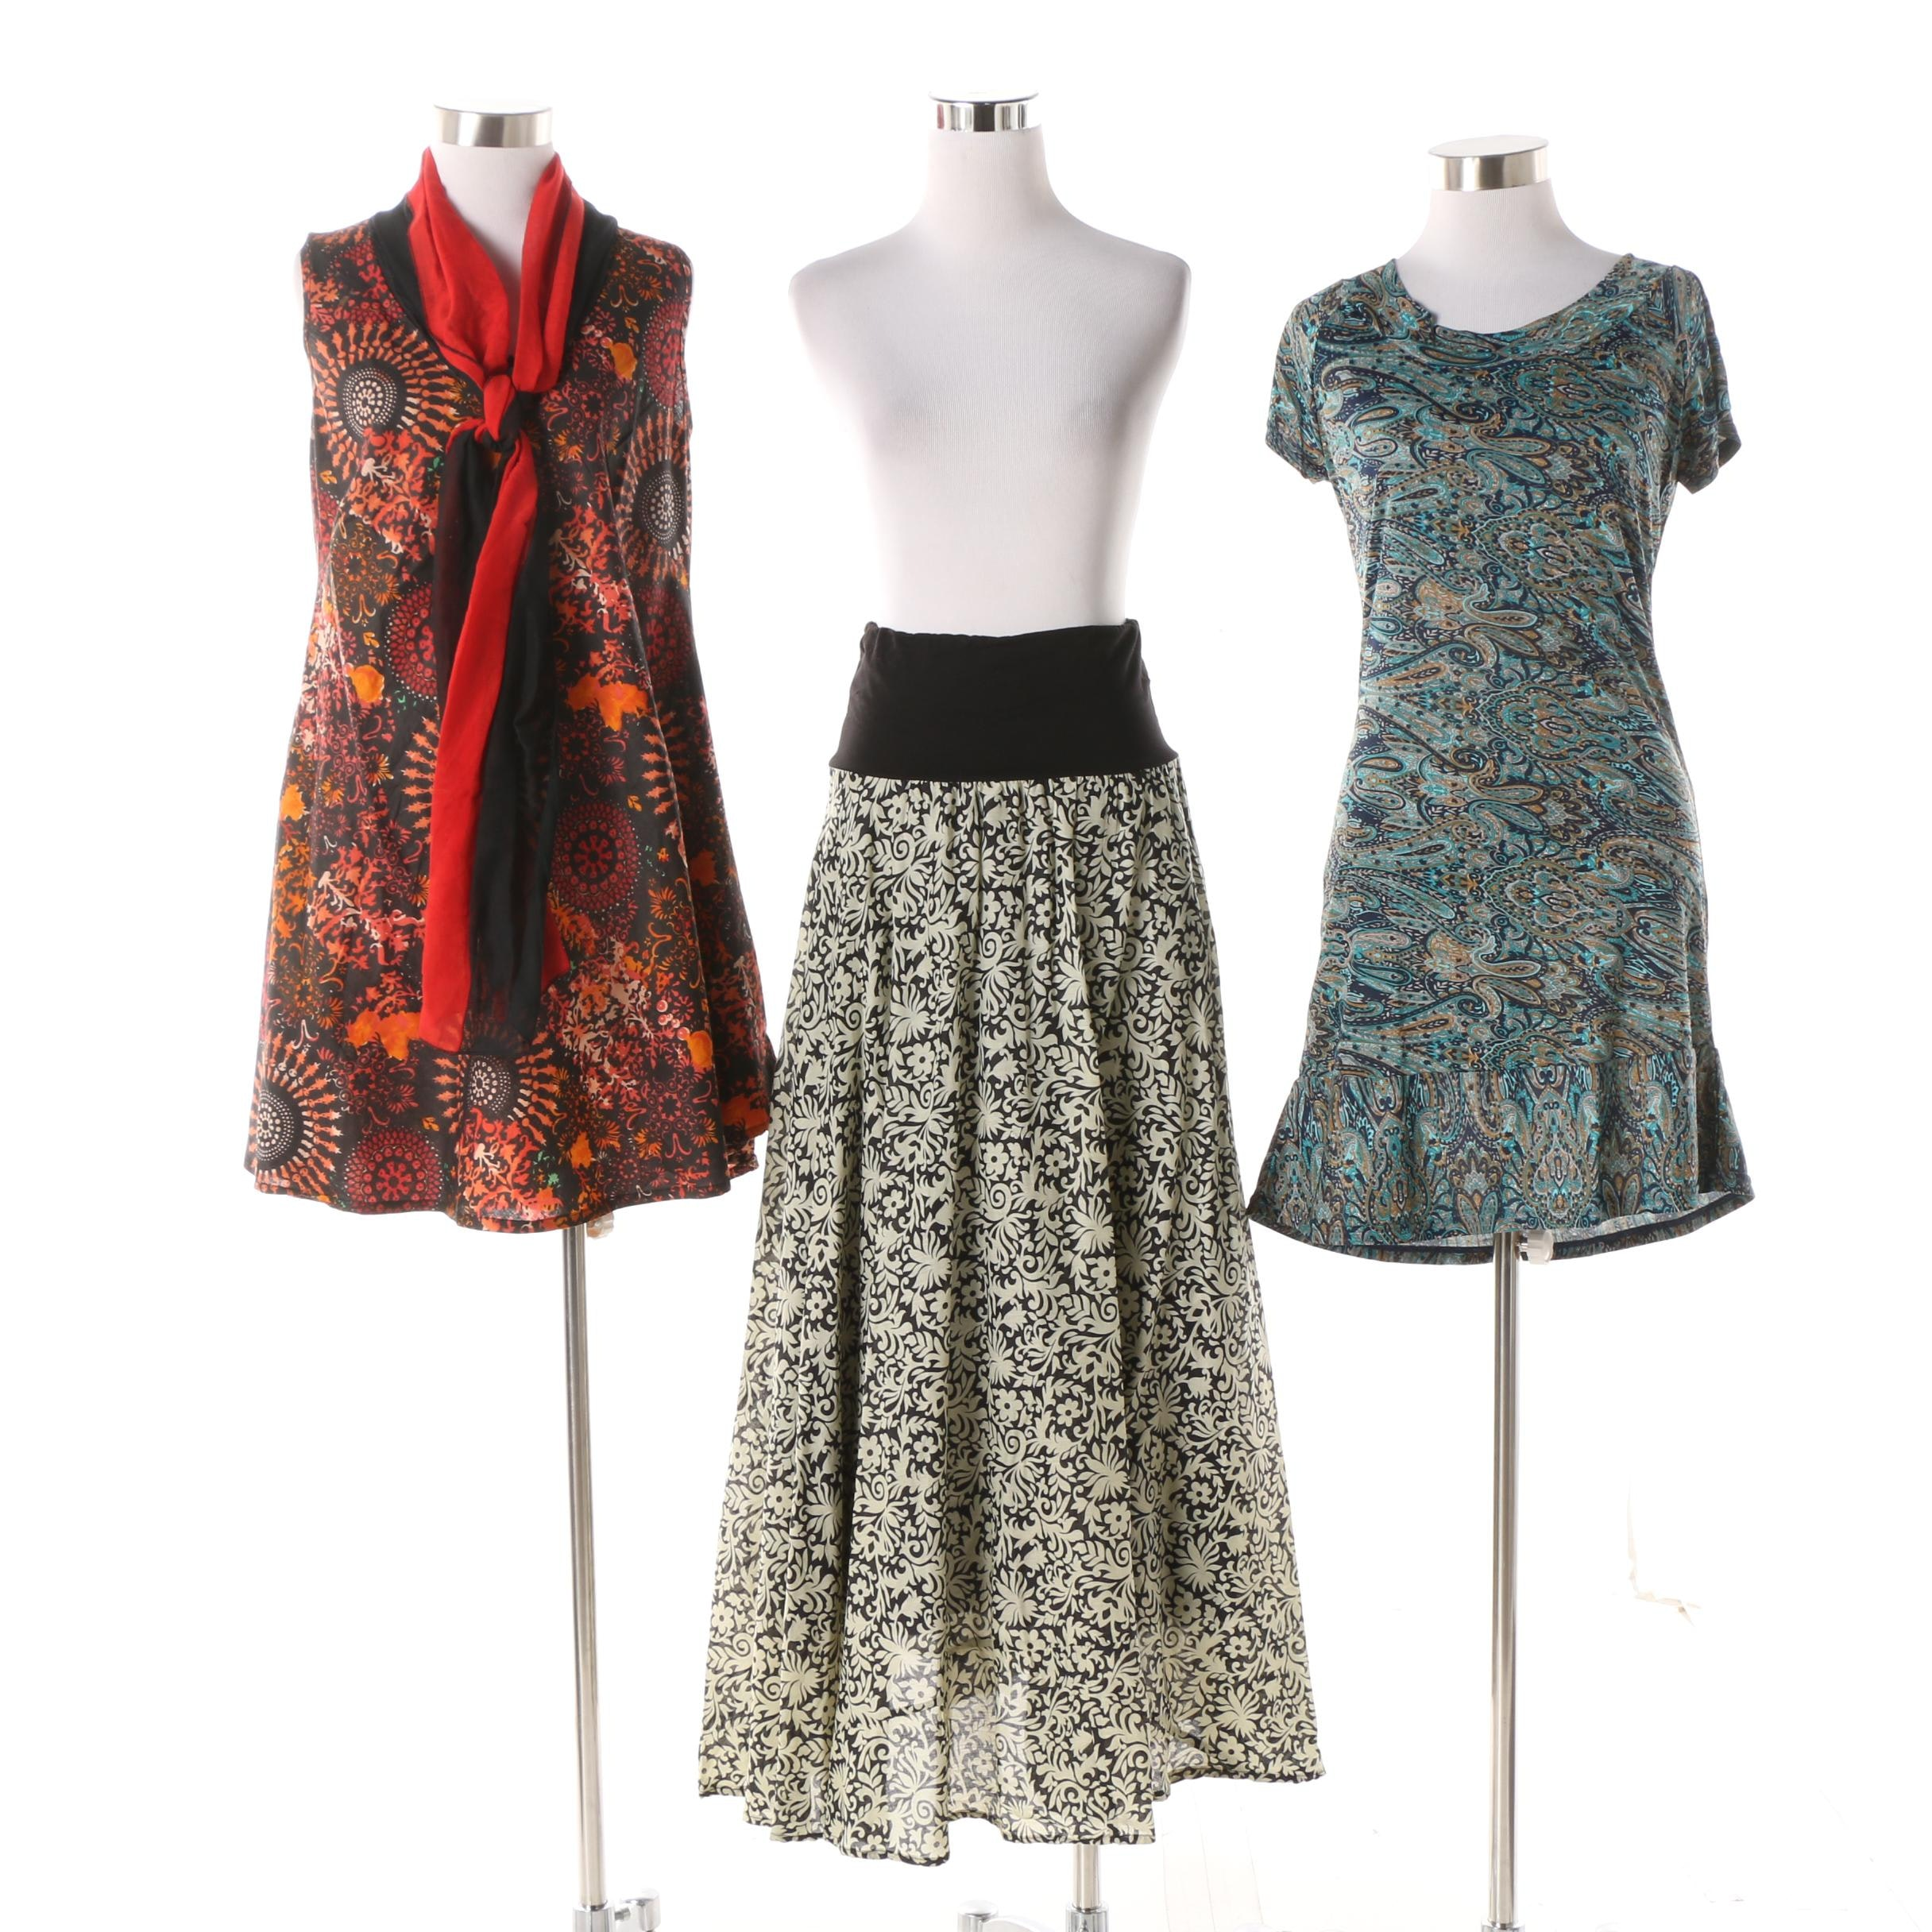 Aller Simplement Paisley Stretch Dress, Filigree Maxi Skirt and Mandala Tunic